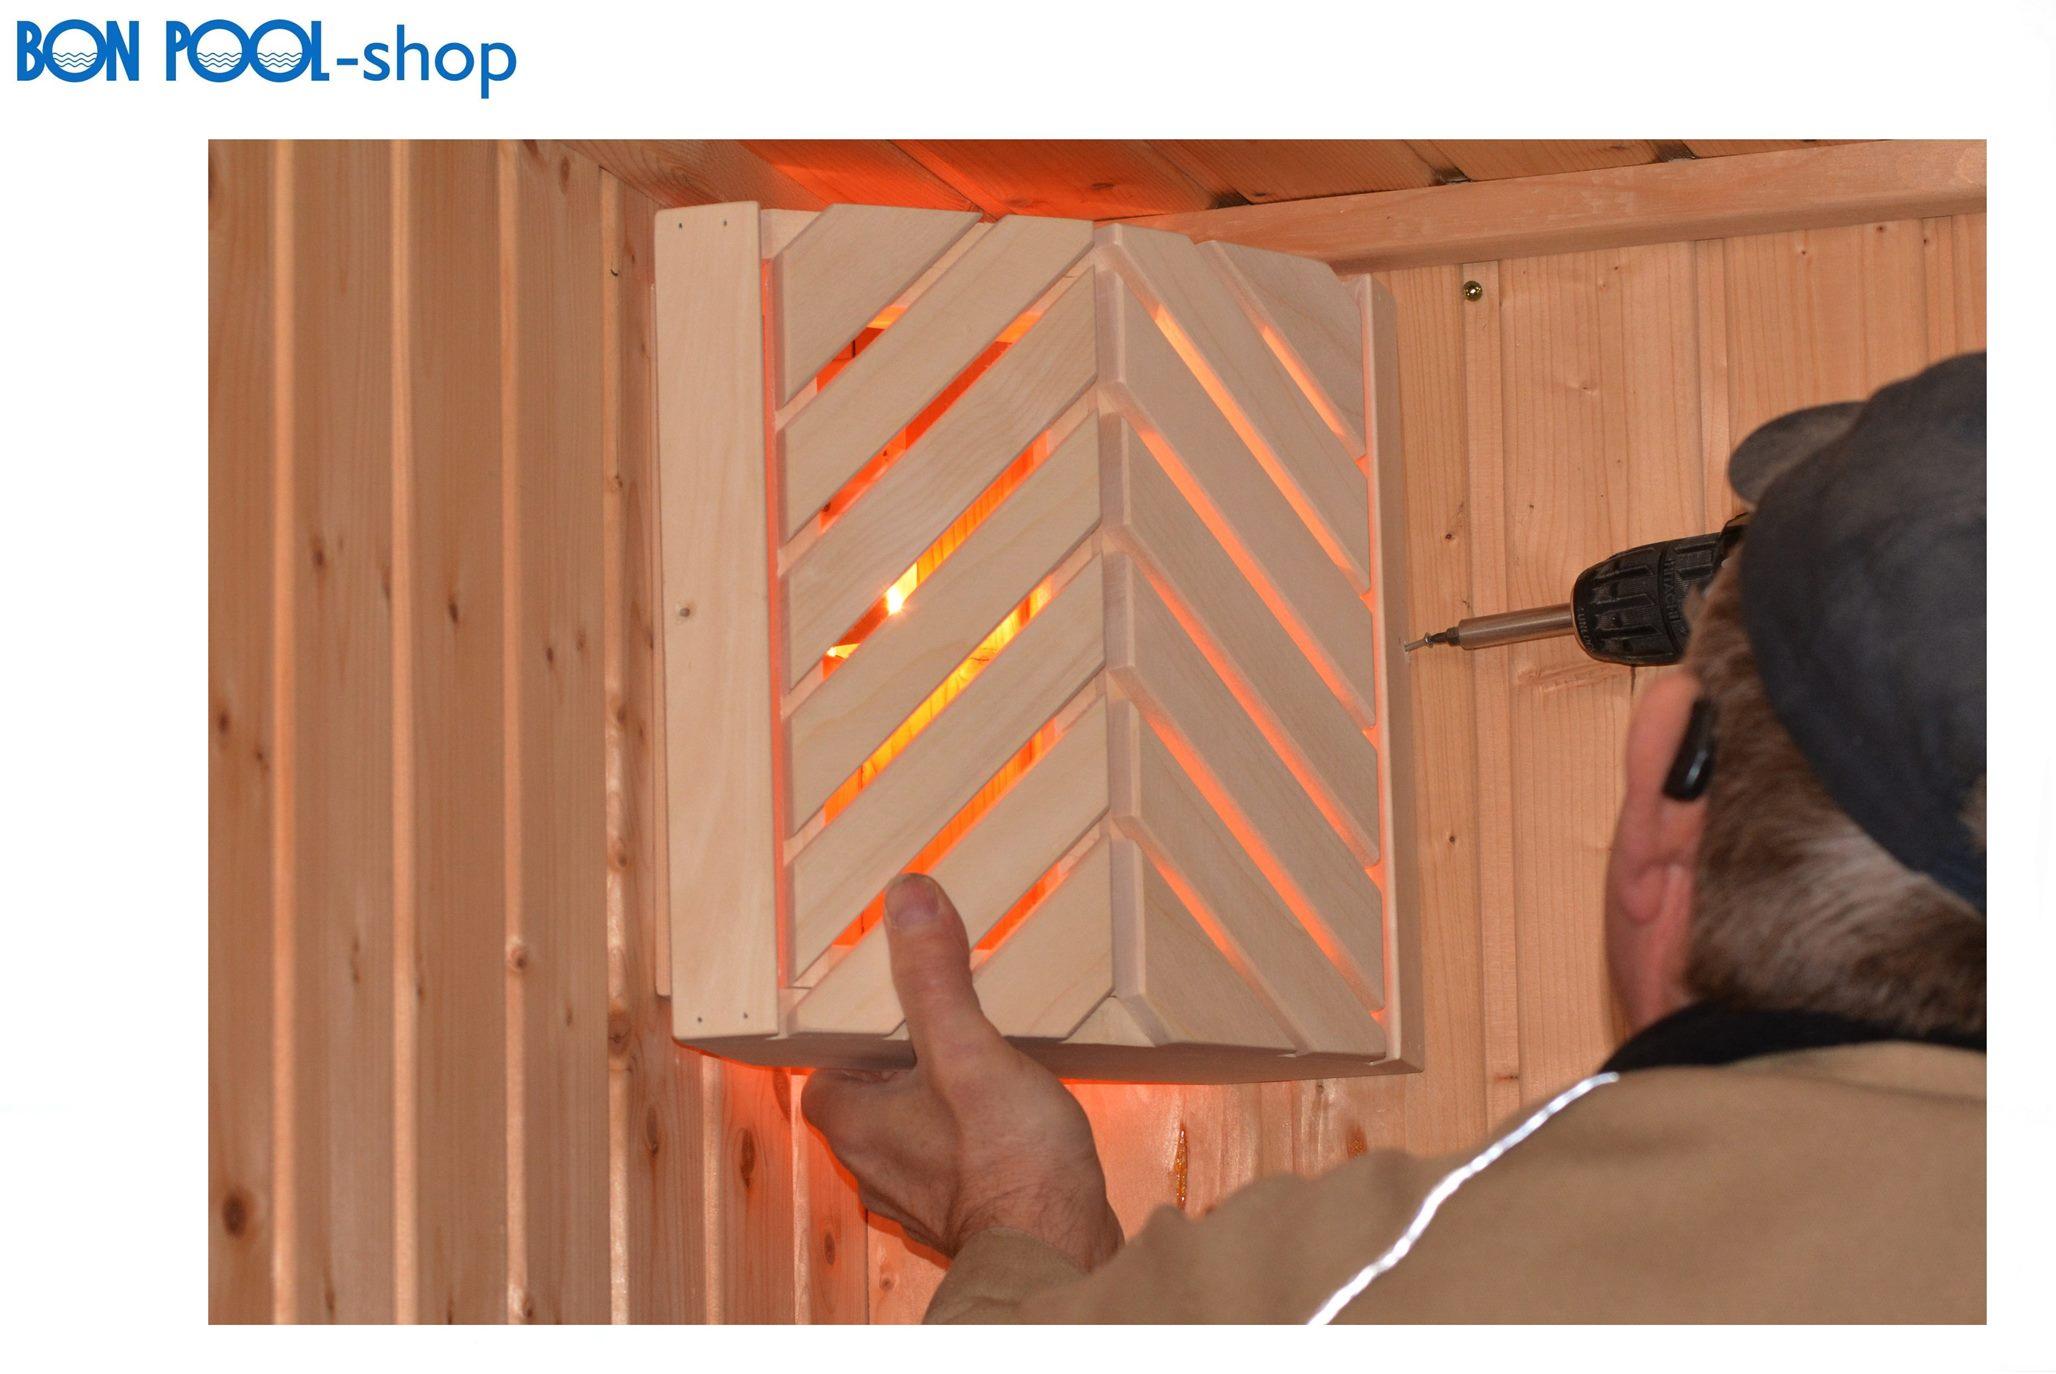 saunaleuchte espe sauna lampe blendschirm bon pool. Black Bedroom Furniture Sets. Home Design Ideas